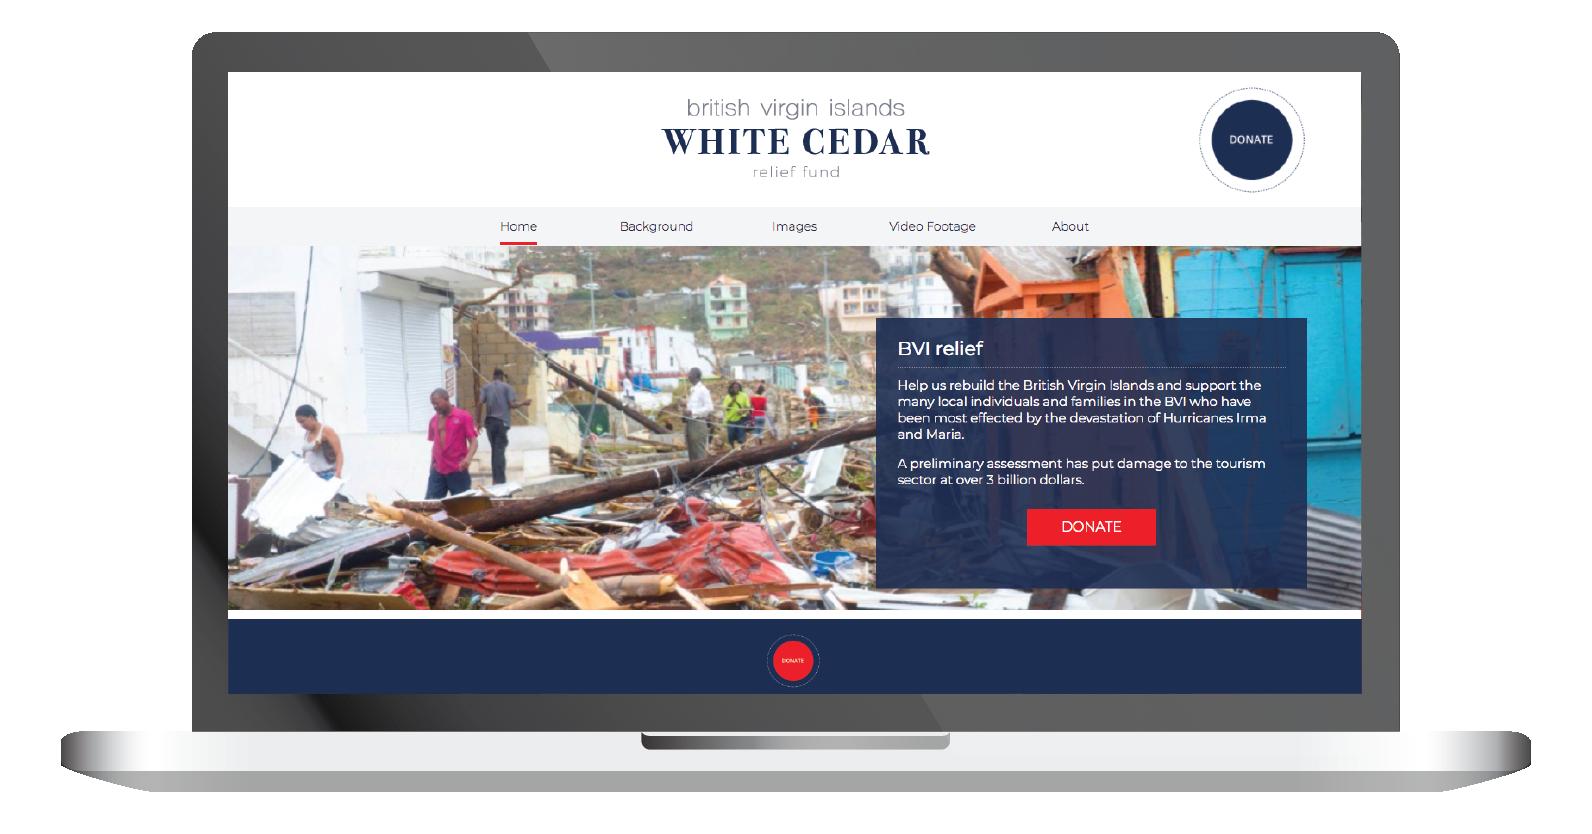 bvi white cedar relief fund home page website